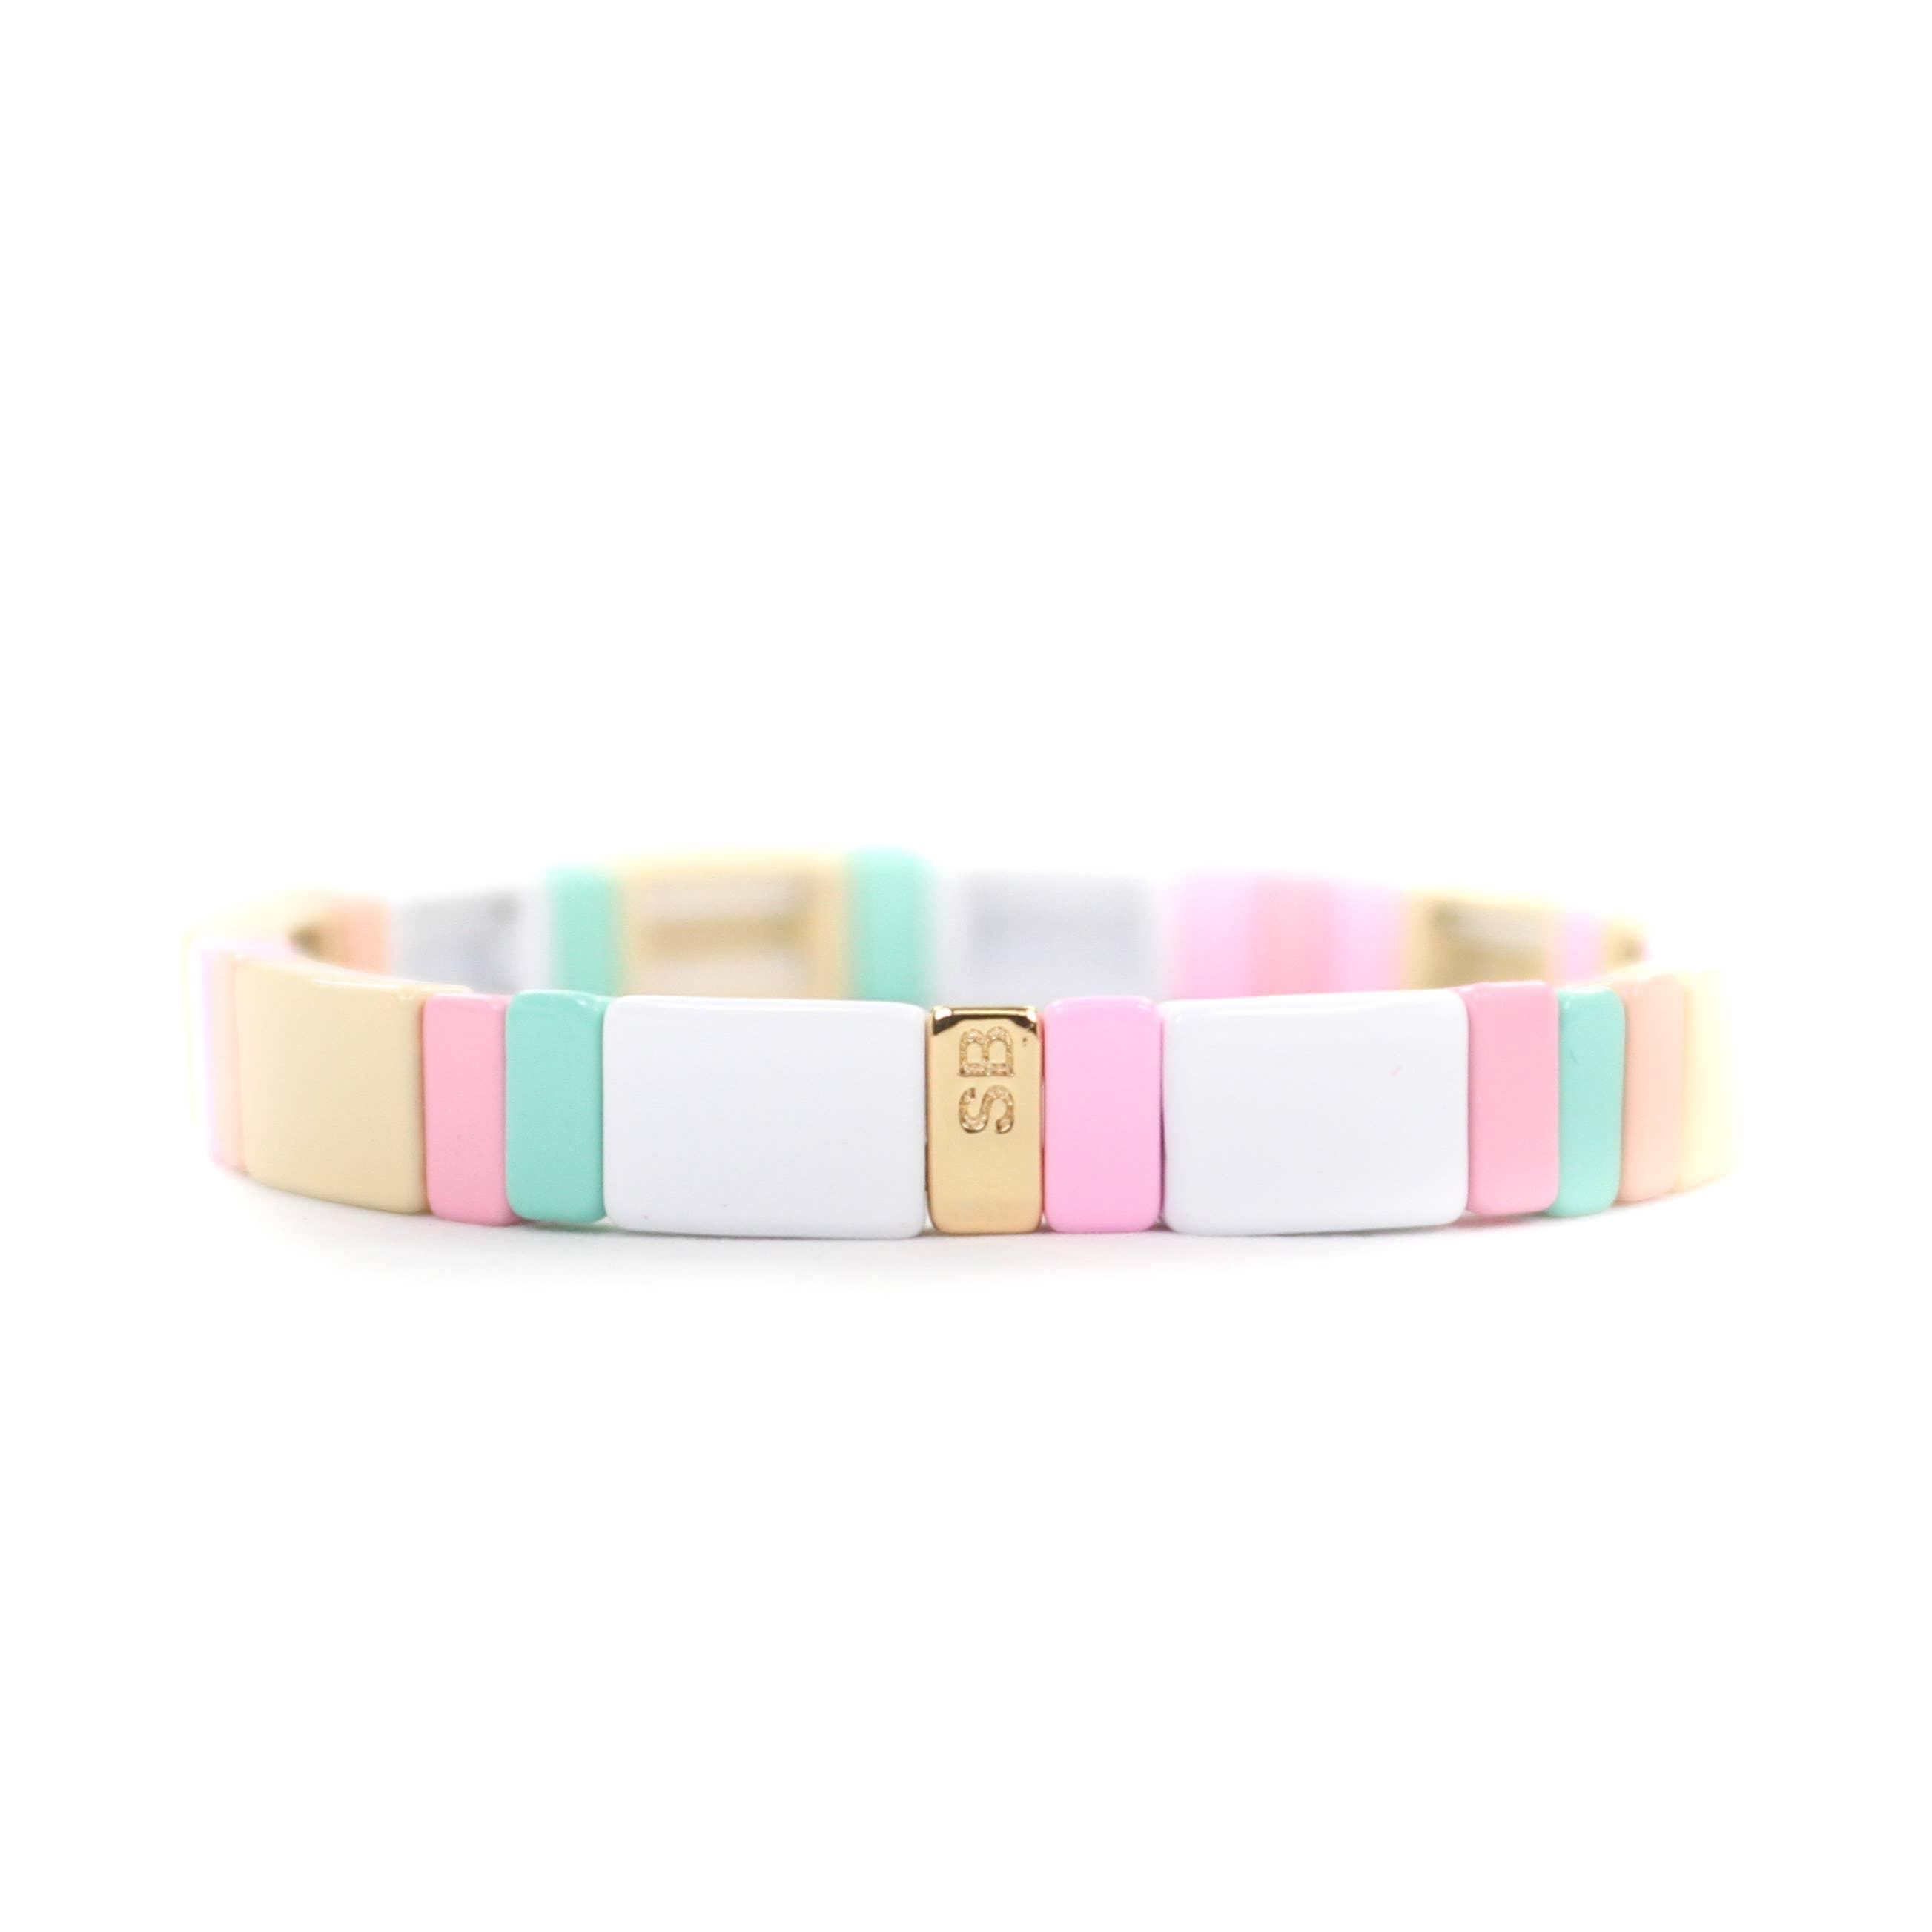 The Rectangle enamel bracelet in Pink